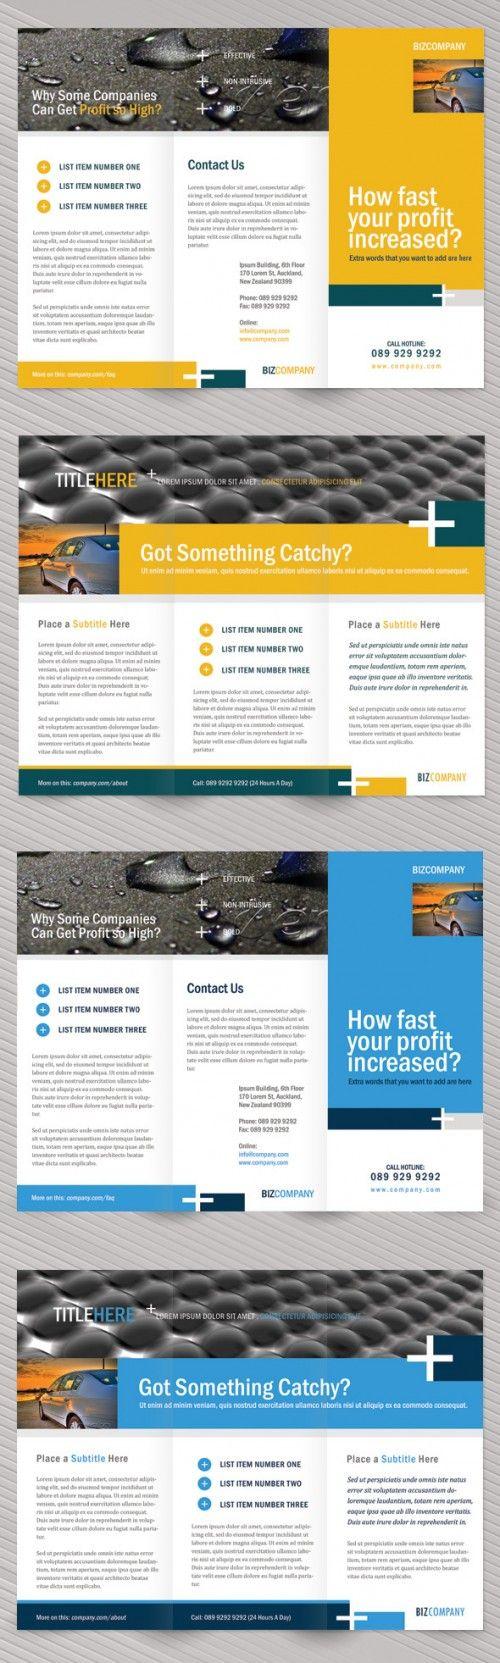 30 Contoh Desain Brosur Lipat Tiga | 26_Trifold-Brochure-Template-500x1663